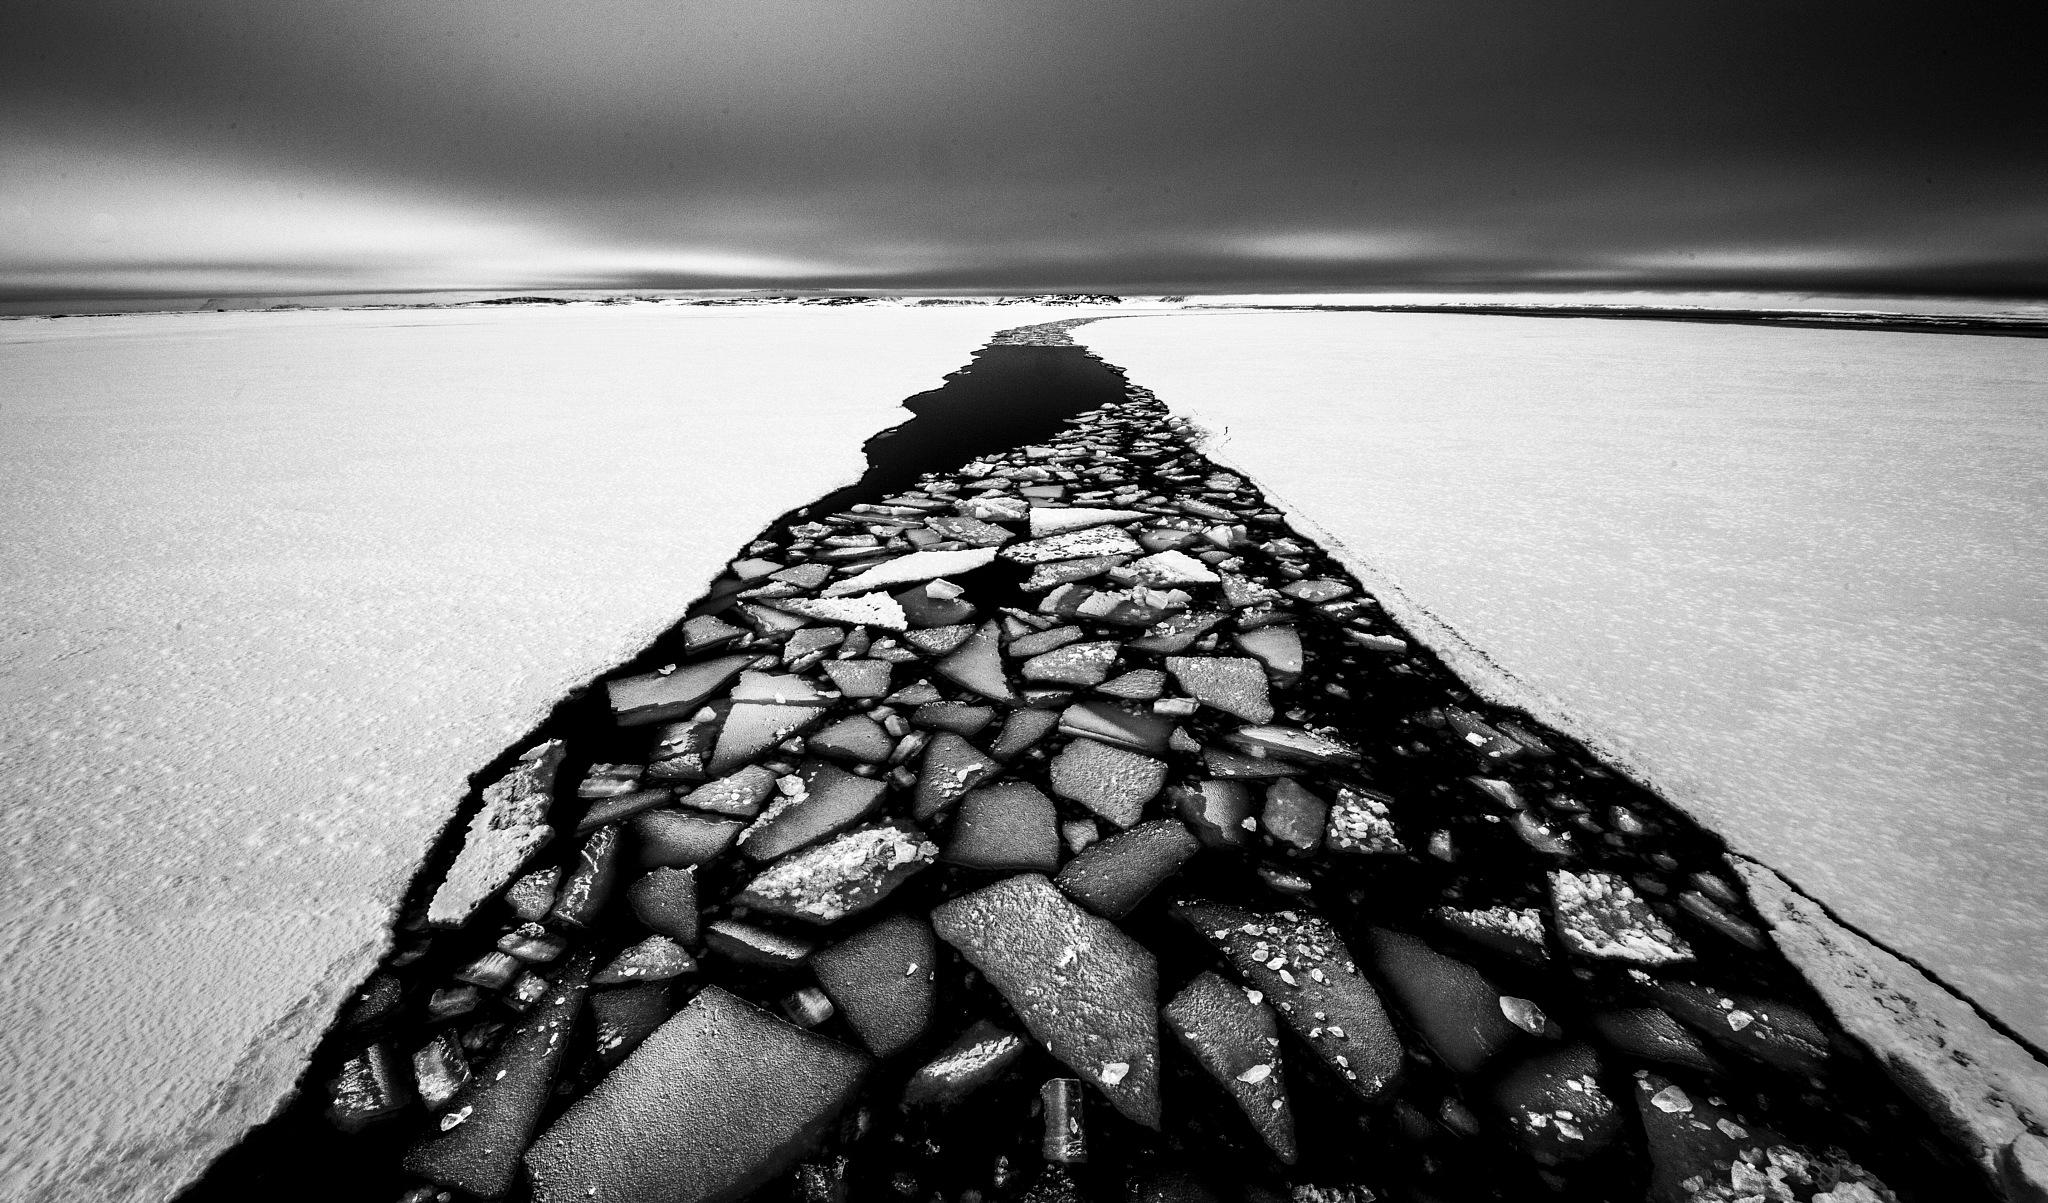 ship's wake, Svalbard by hutchst